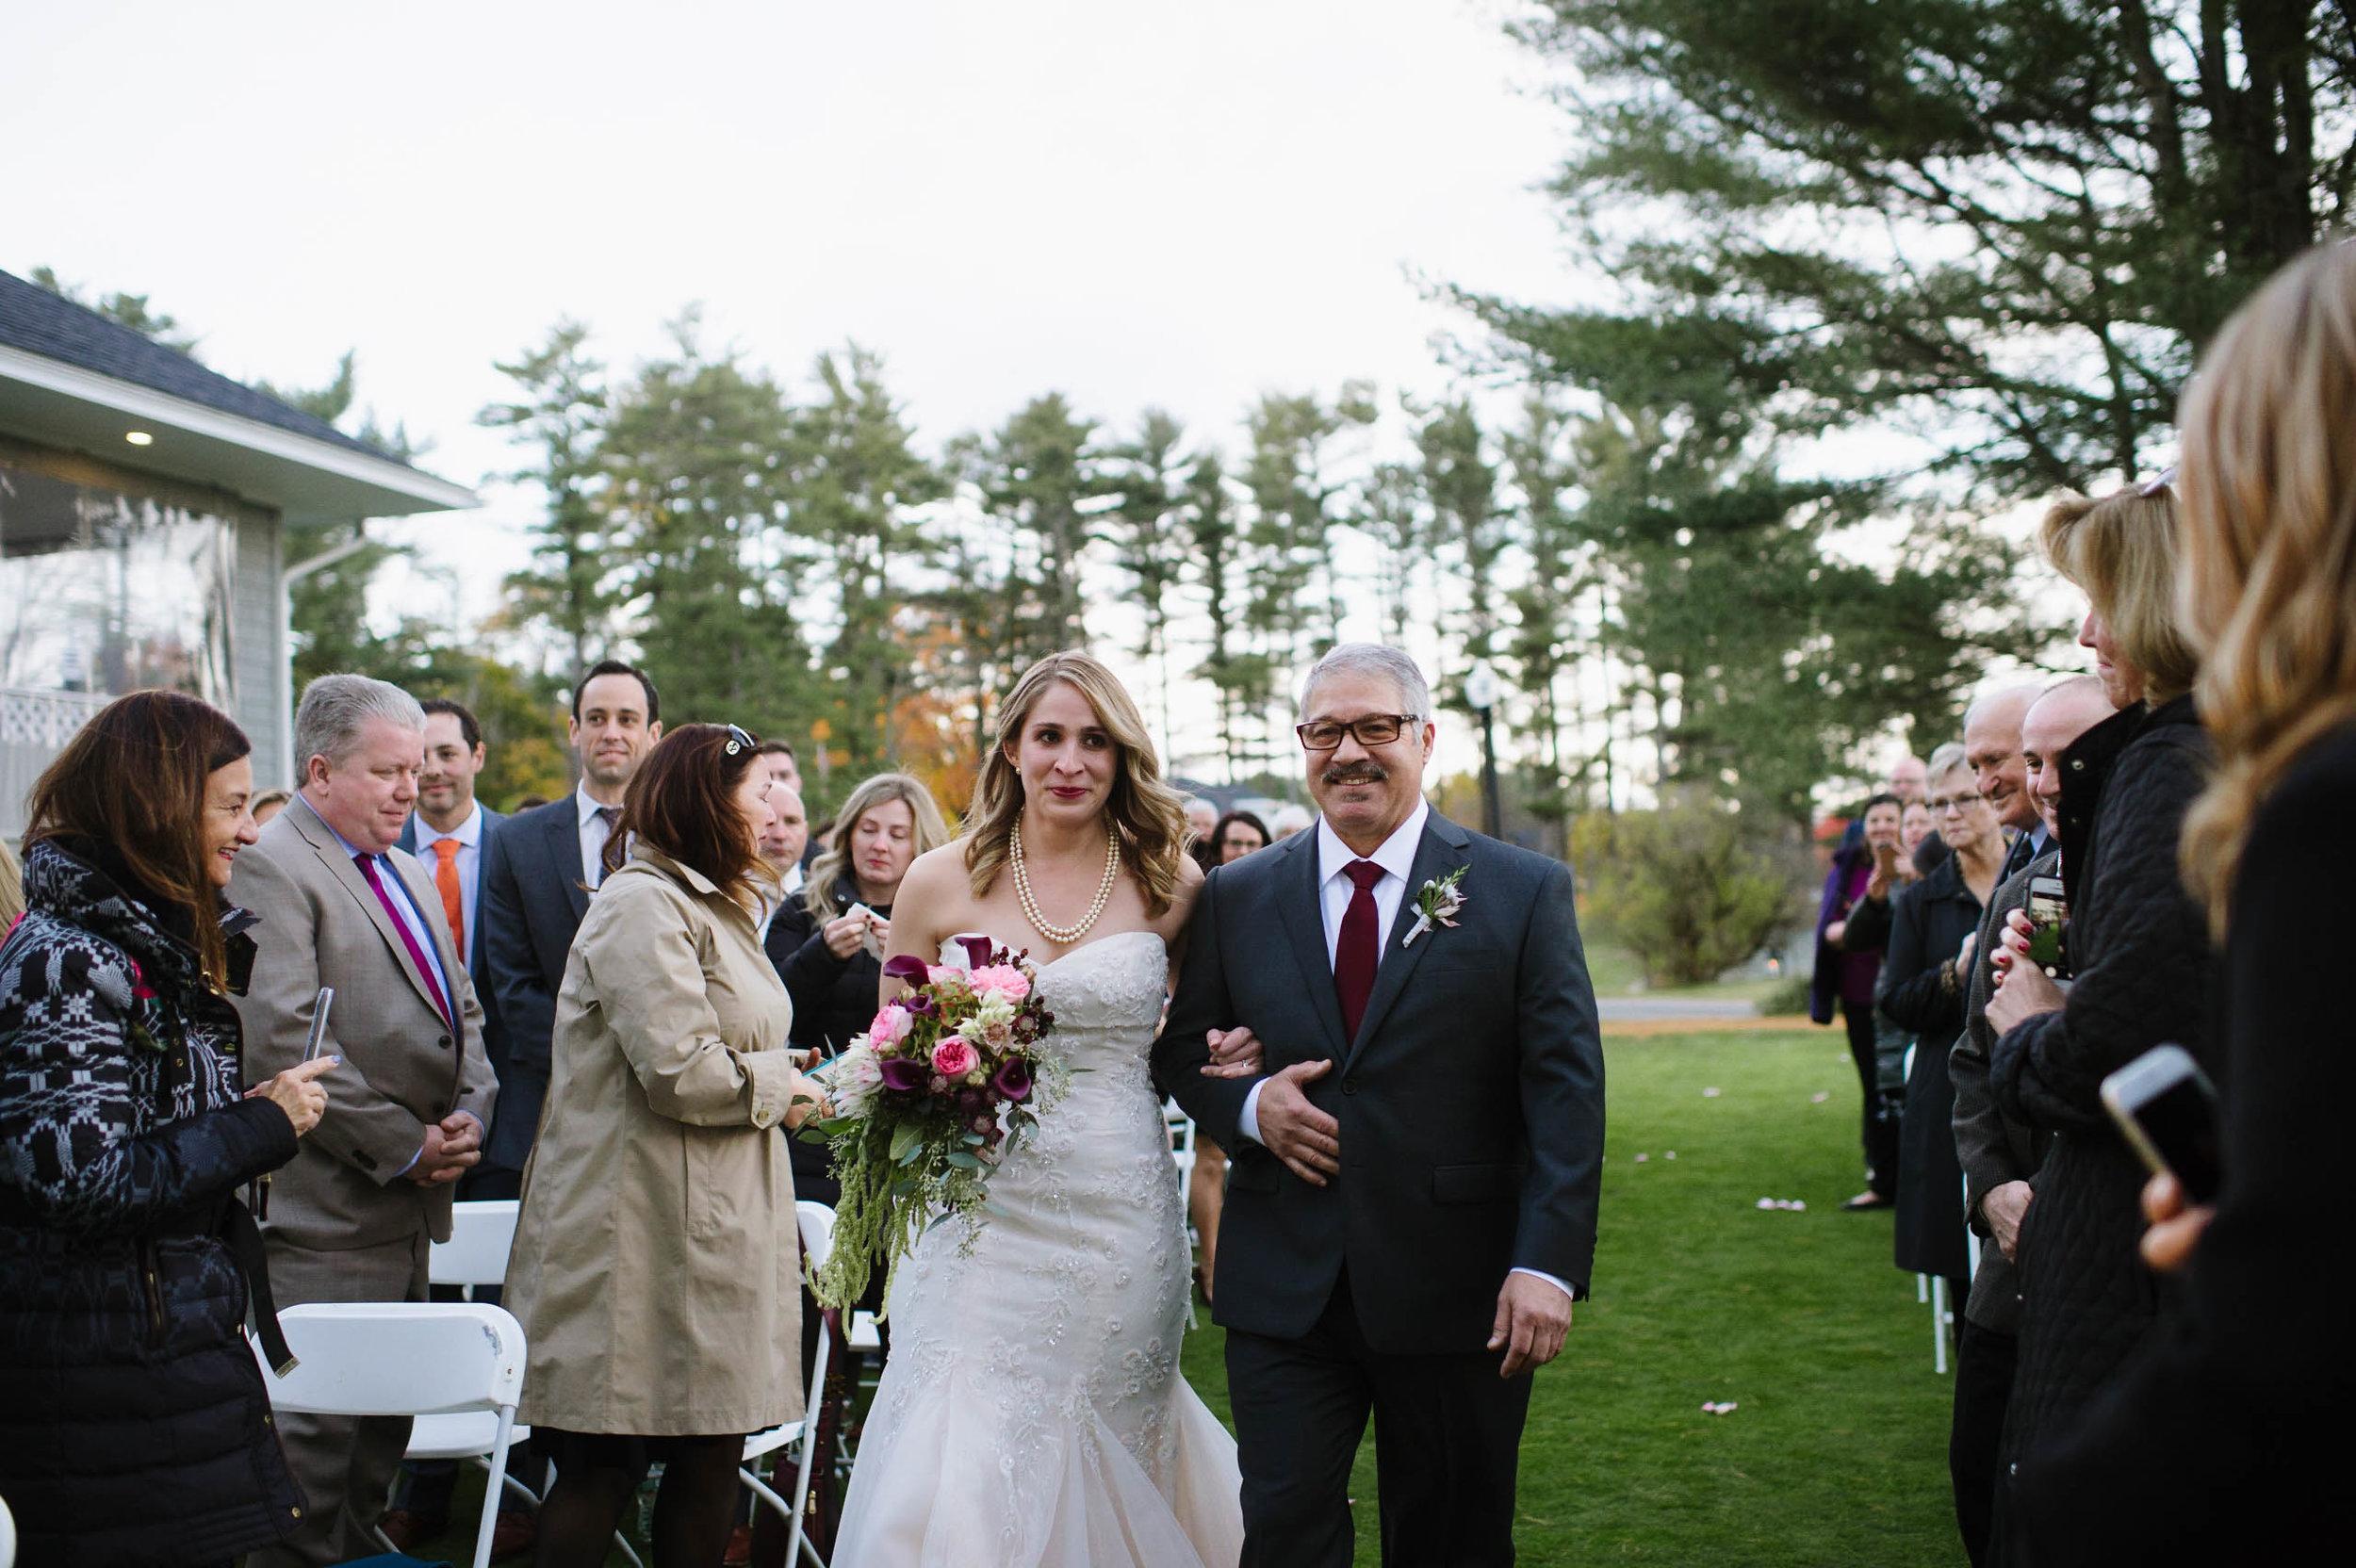 Boston-Creative-Wedding-Photography05.jpg